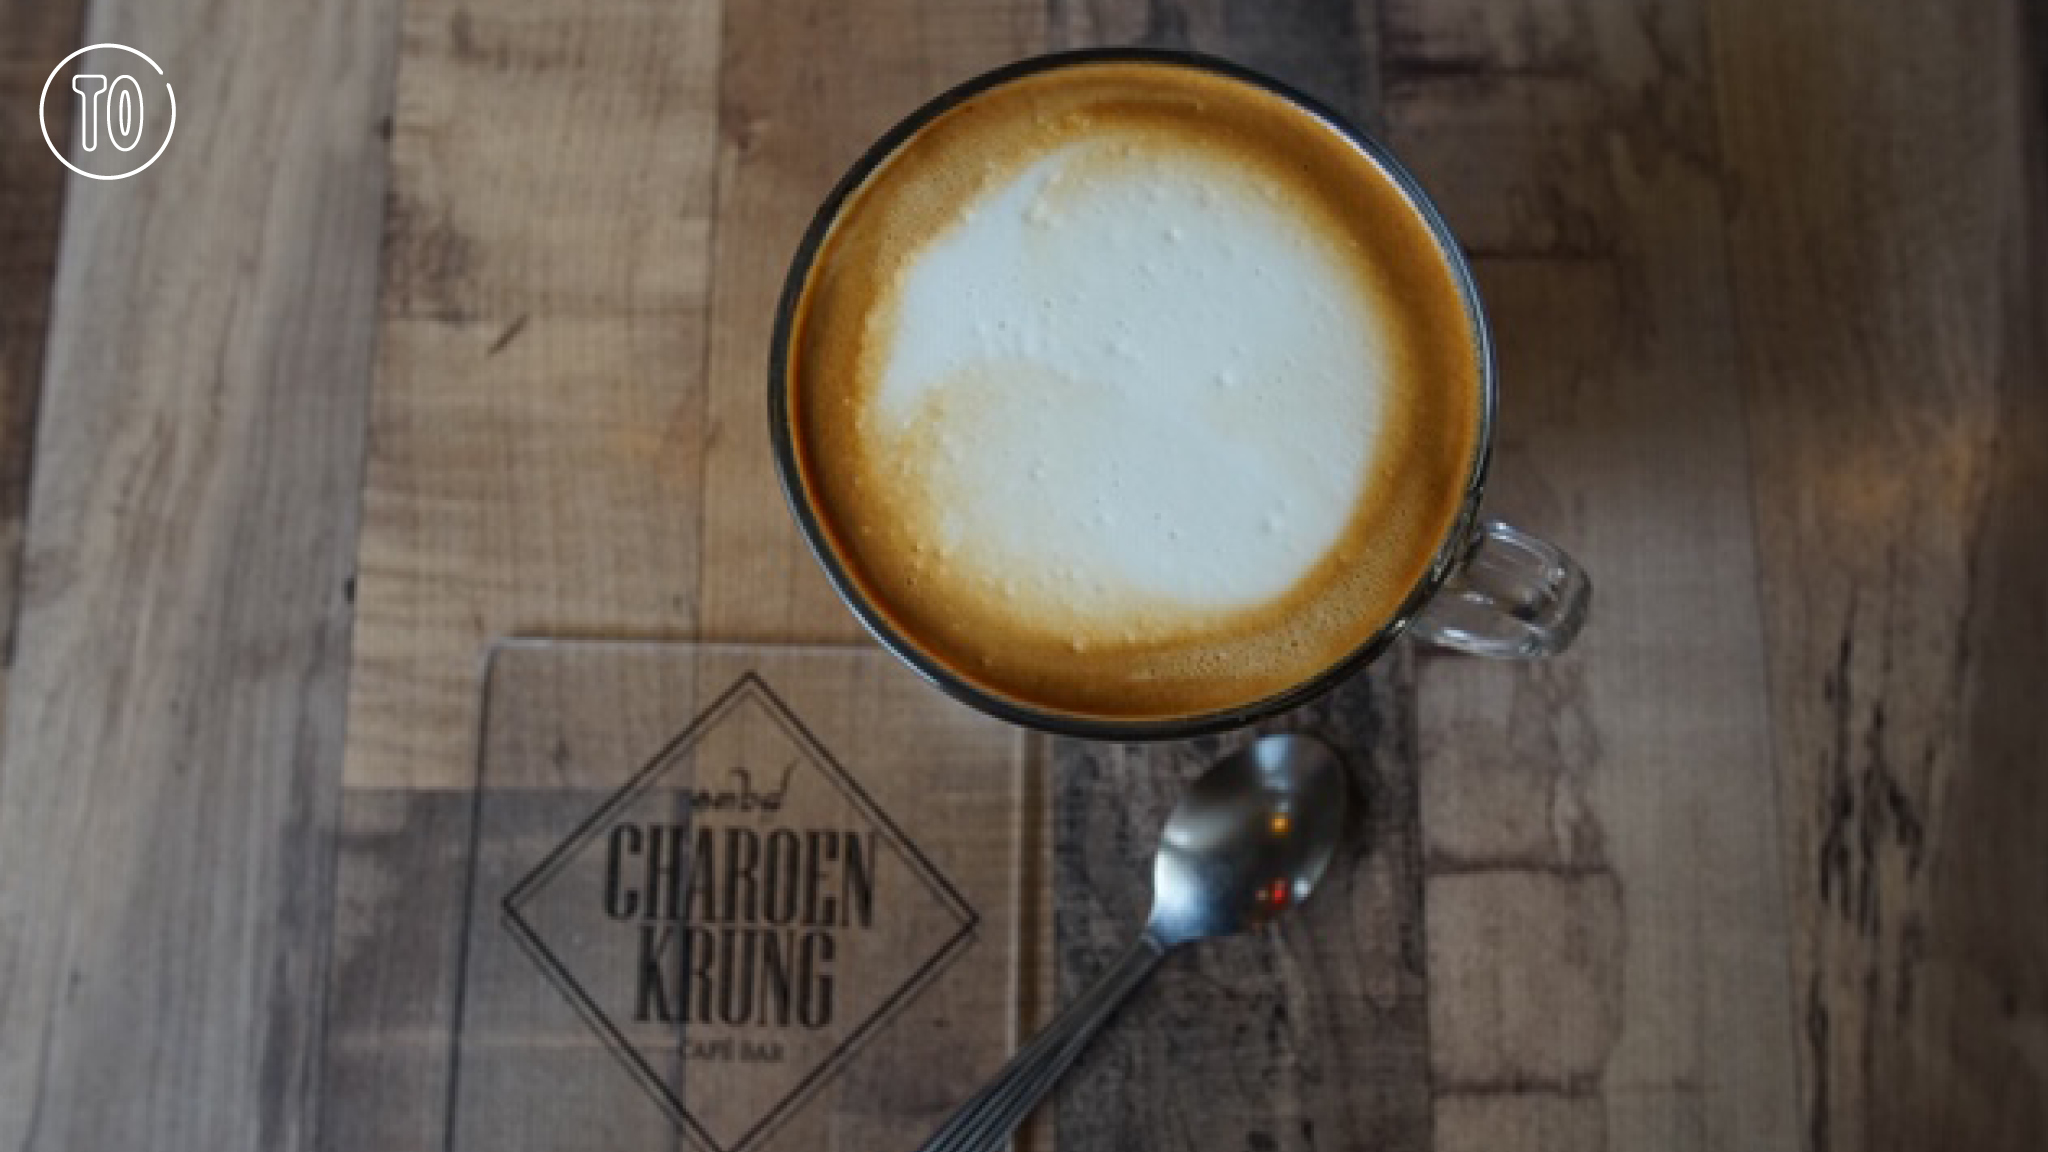 Charoenkrung Cafe Bar